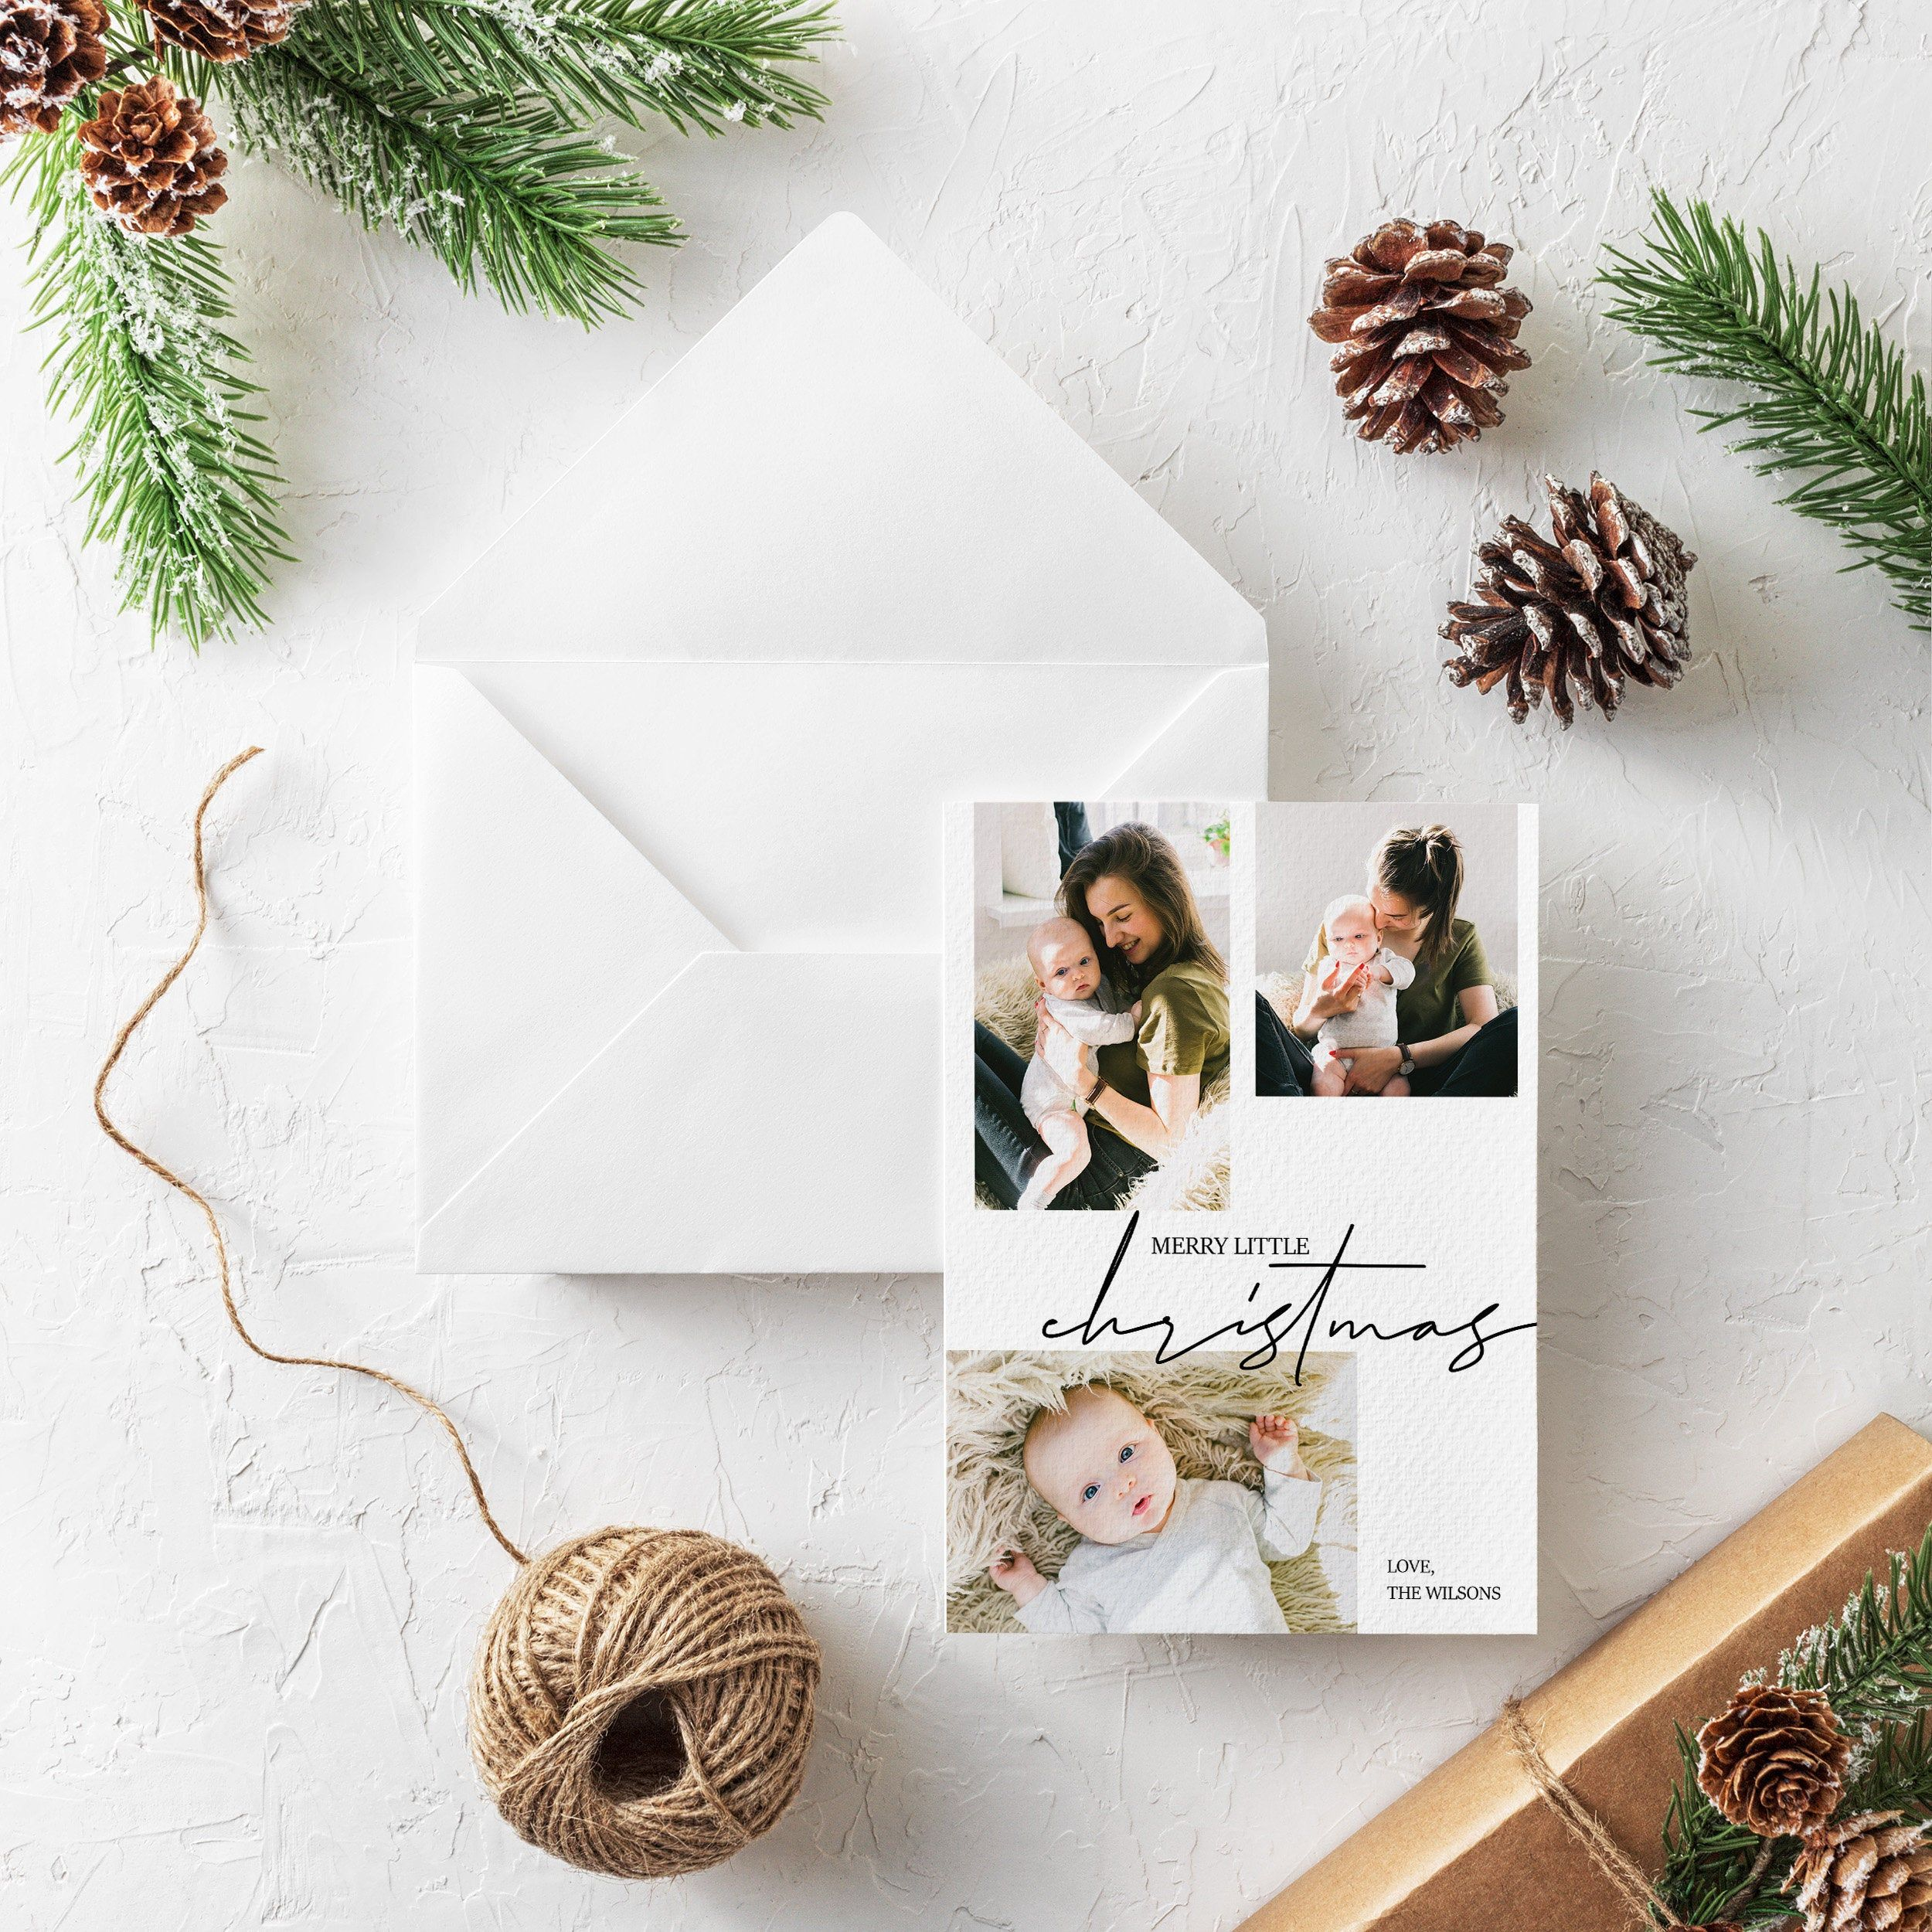 Merry Little Christmas Digital Card Holiday Festive Printable